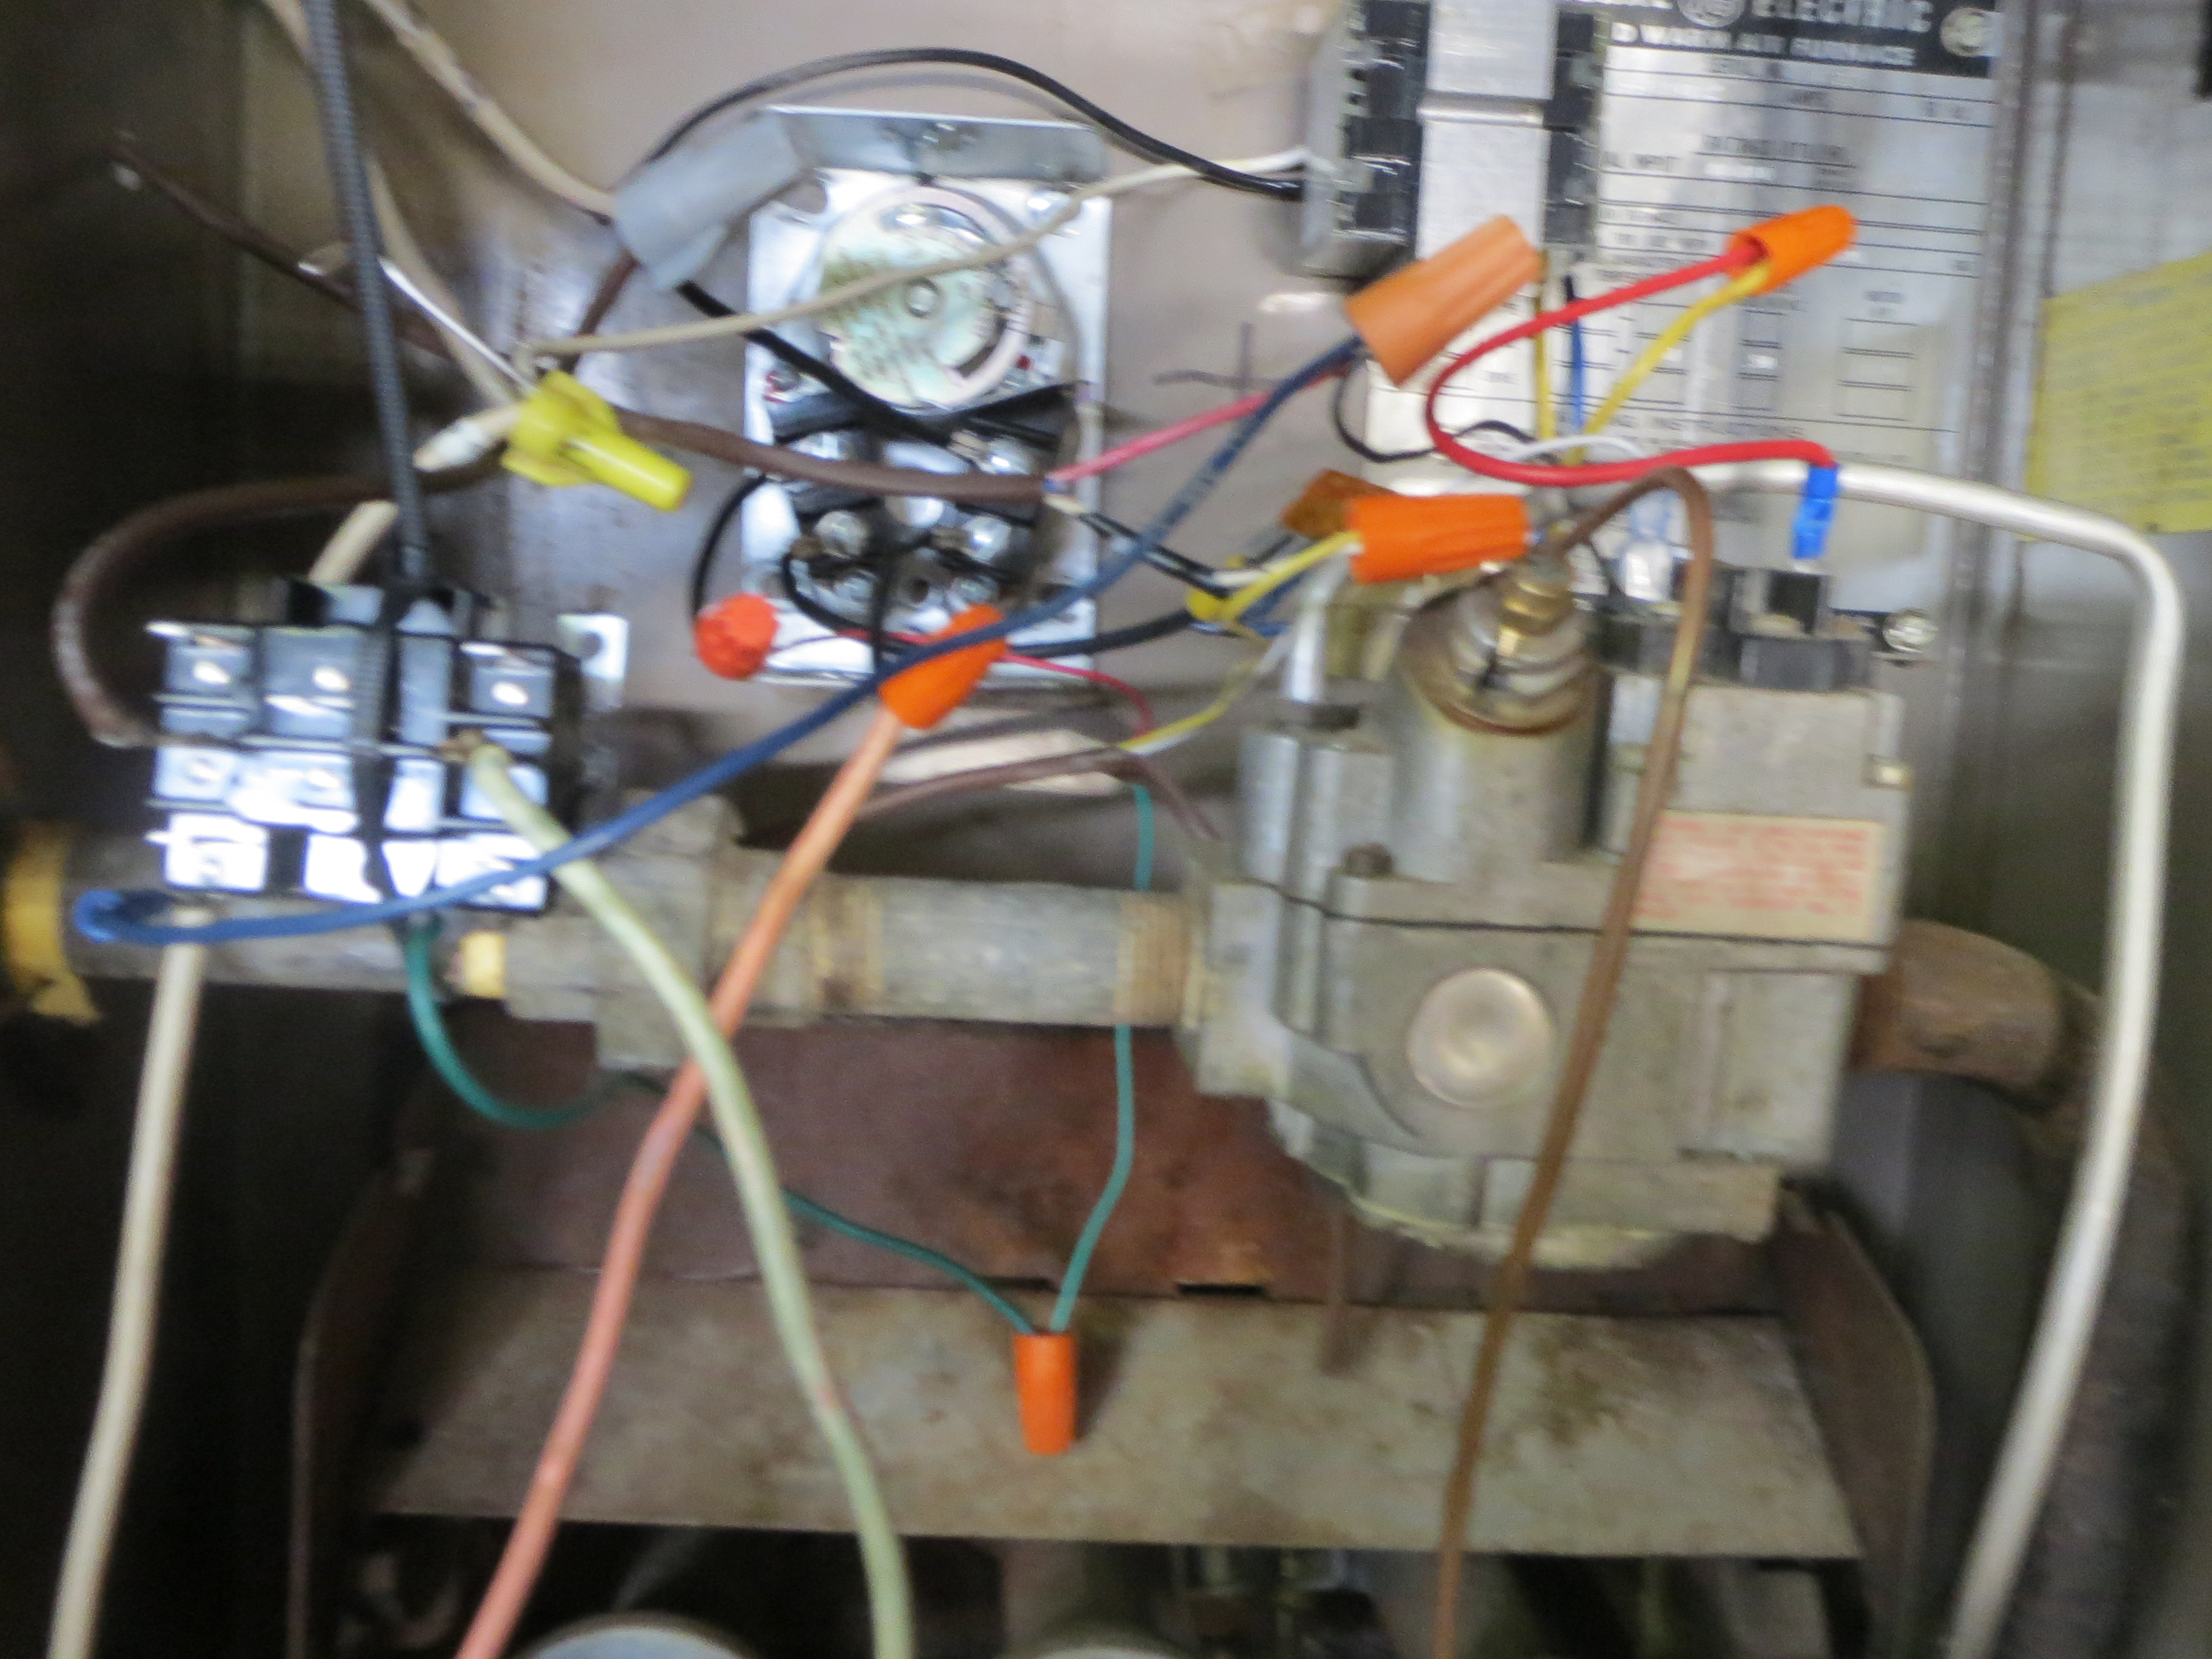 Ge Gas Furnace Wiring - 97 Wrangler Radio Wiring Diagram  doe-engine-wirings.au-delice-limousin.fr   Ge Gas Furnace Wiring      Bege Place Wiring Diagram